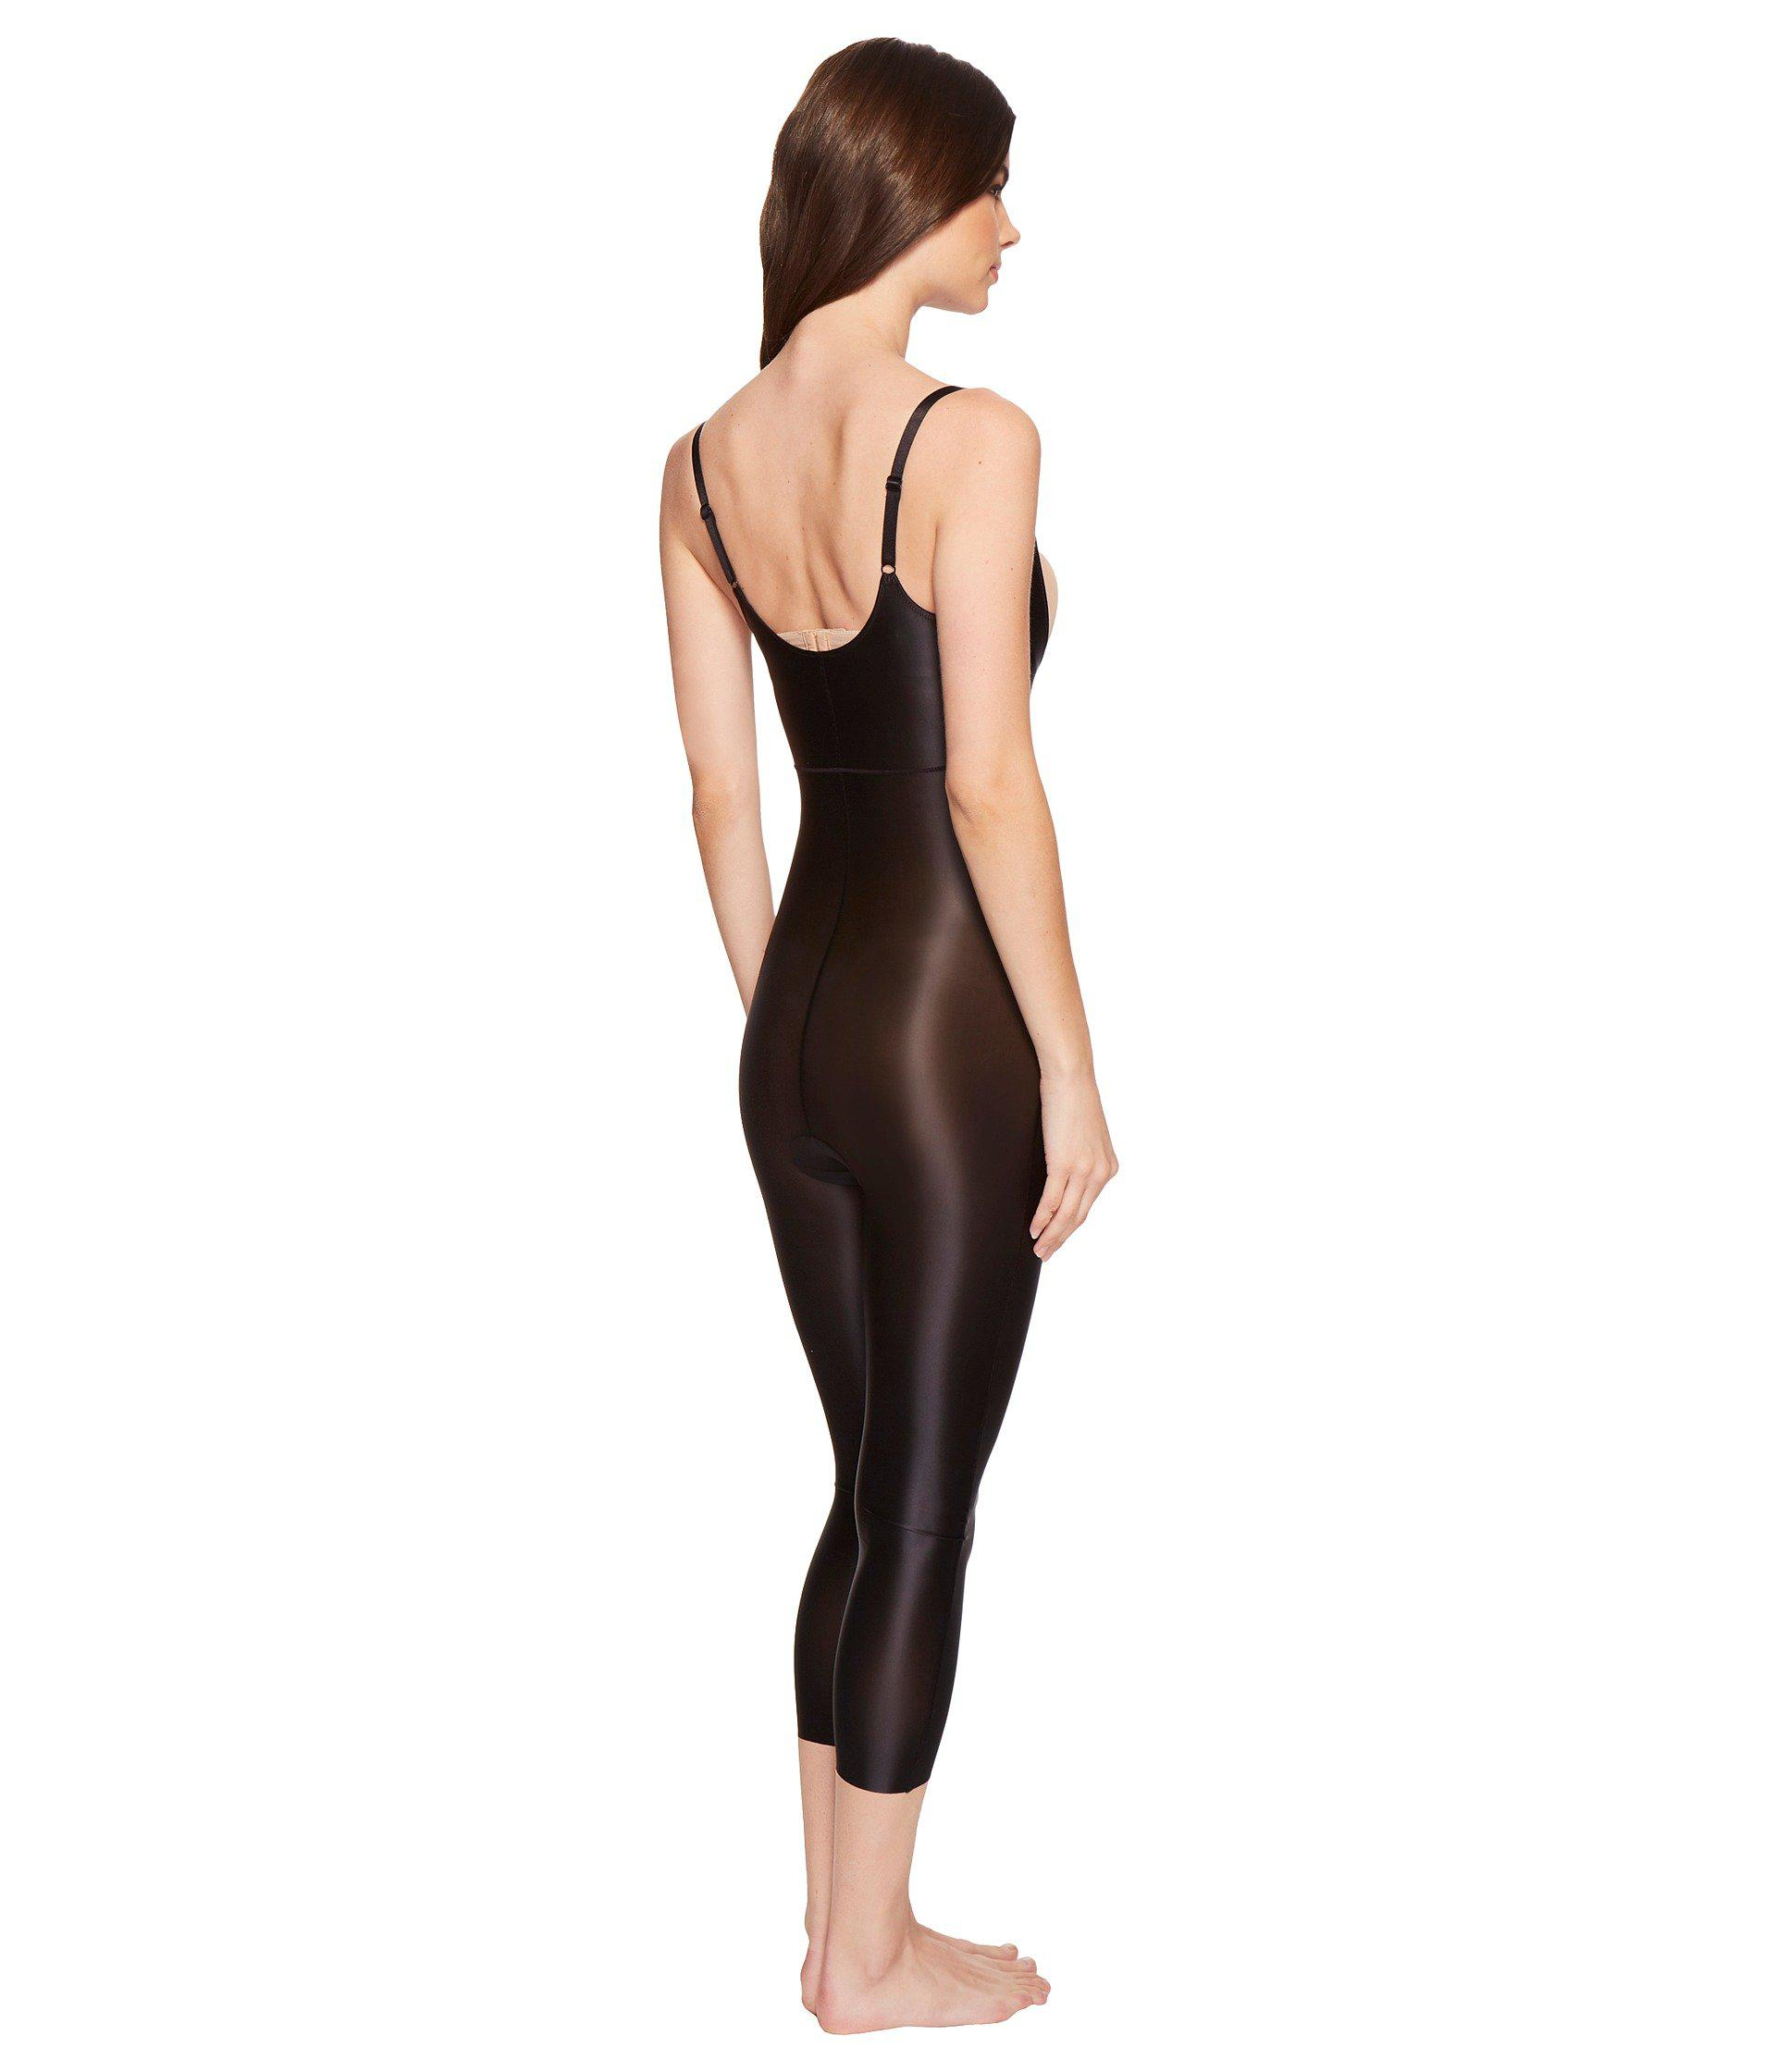 89028874687 Spanx - Black Suit Your Fancy Open-bust Catsuit (broadway Beige) Women s  Jumpsuit. View fullscreen